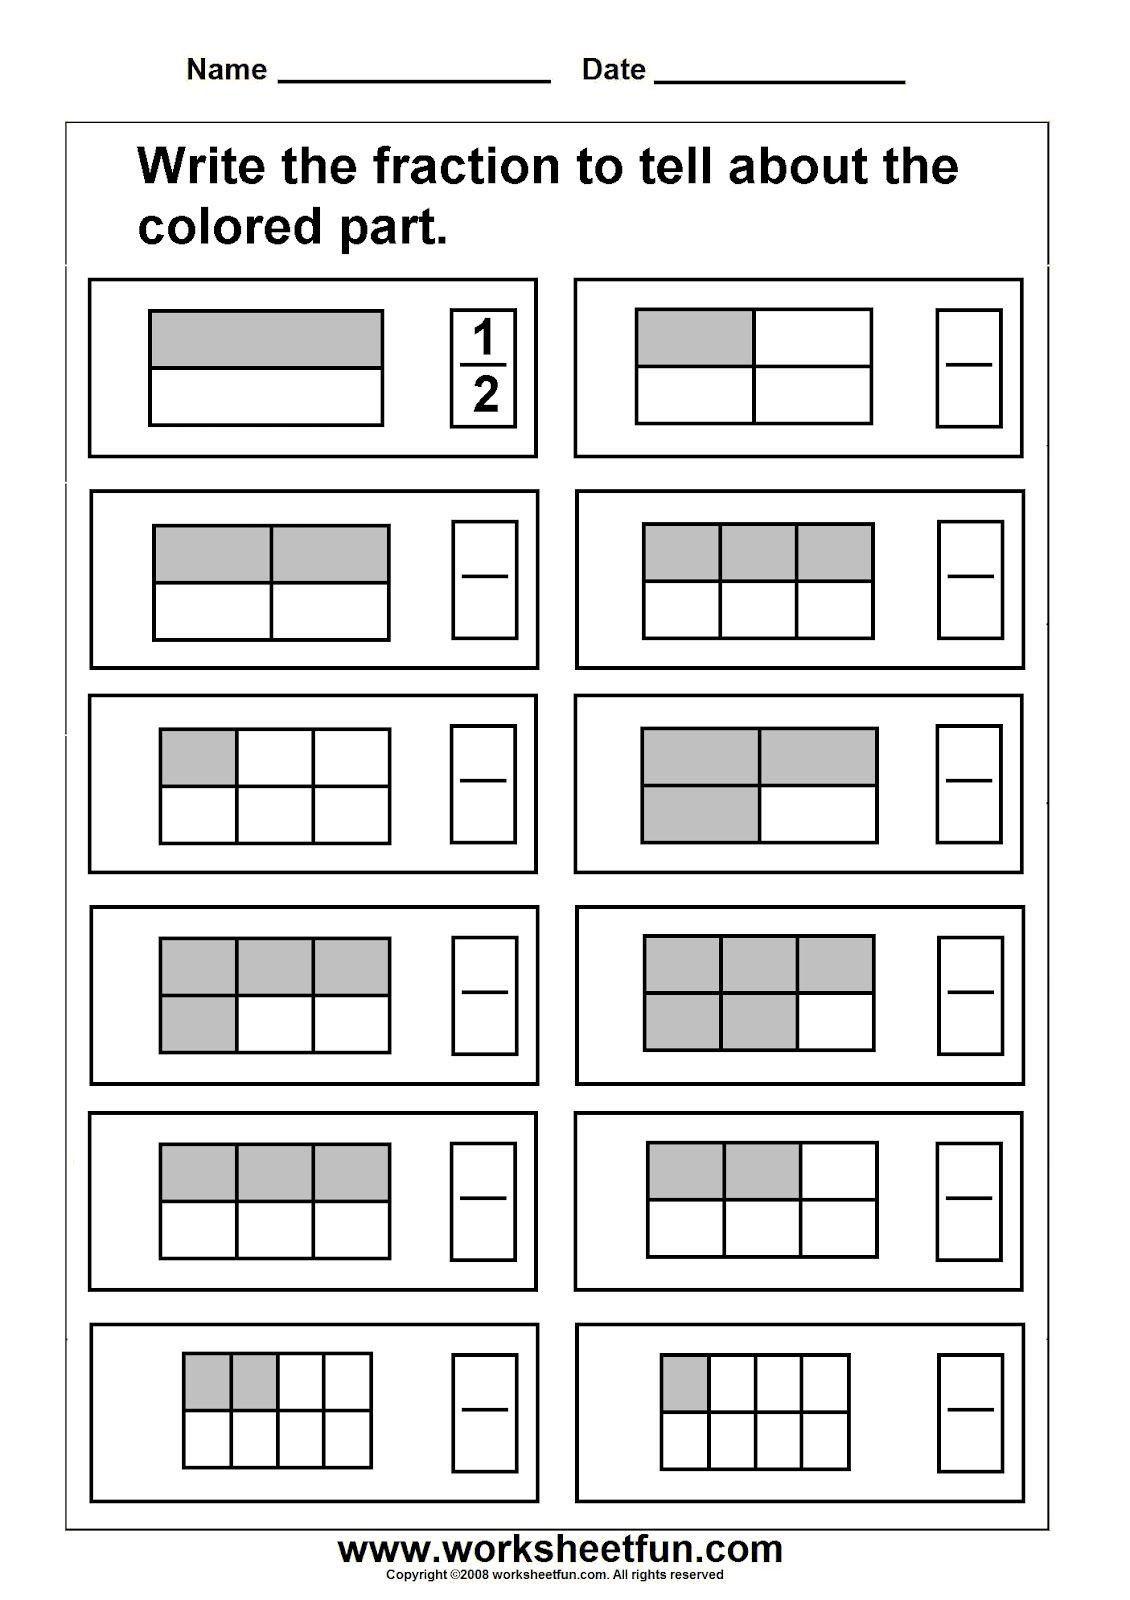 2nd Grade Fractions Worksheet Third Grade Fraction